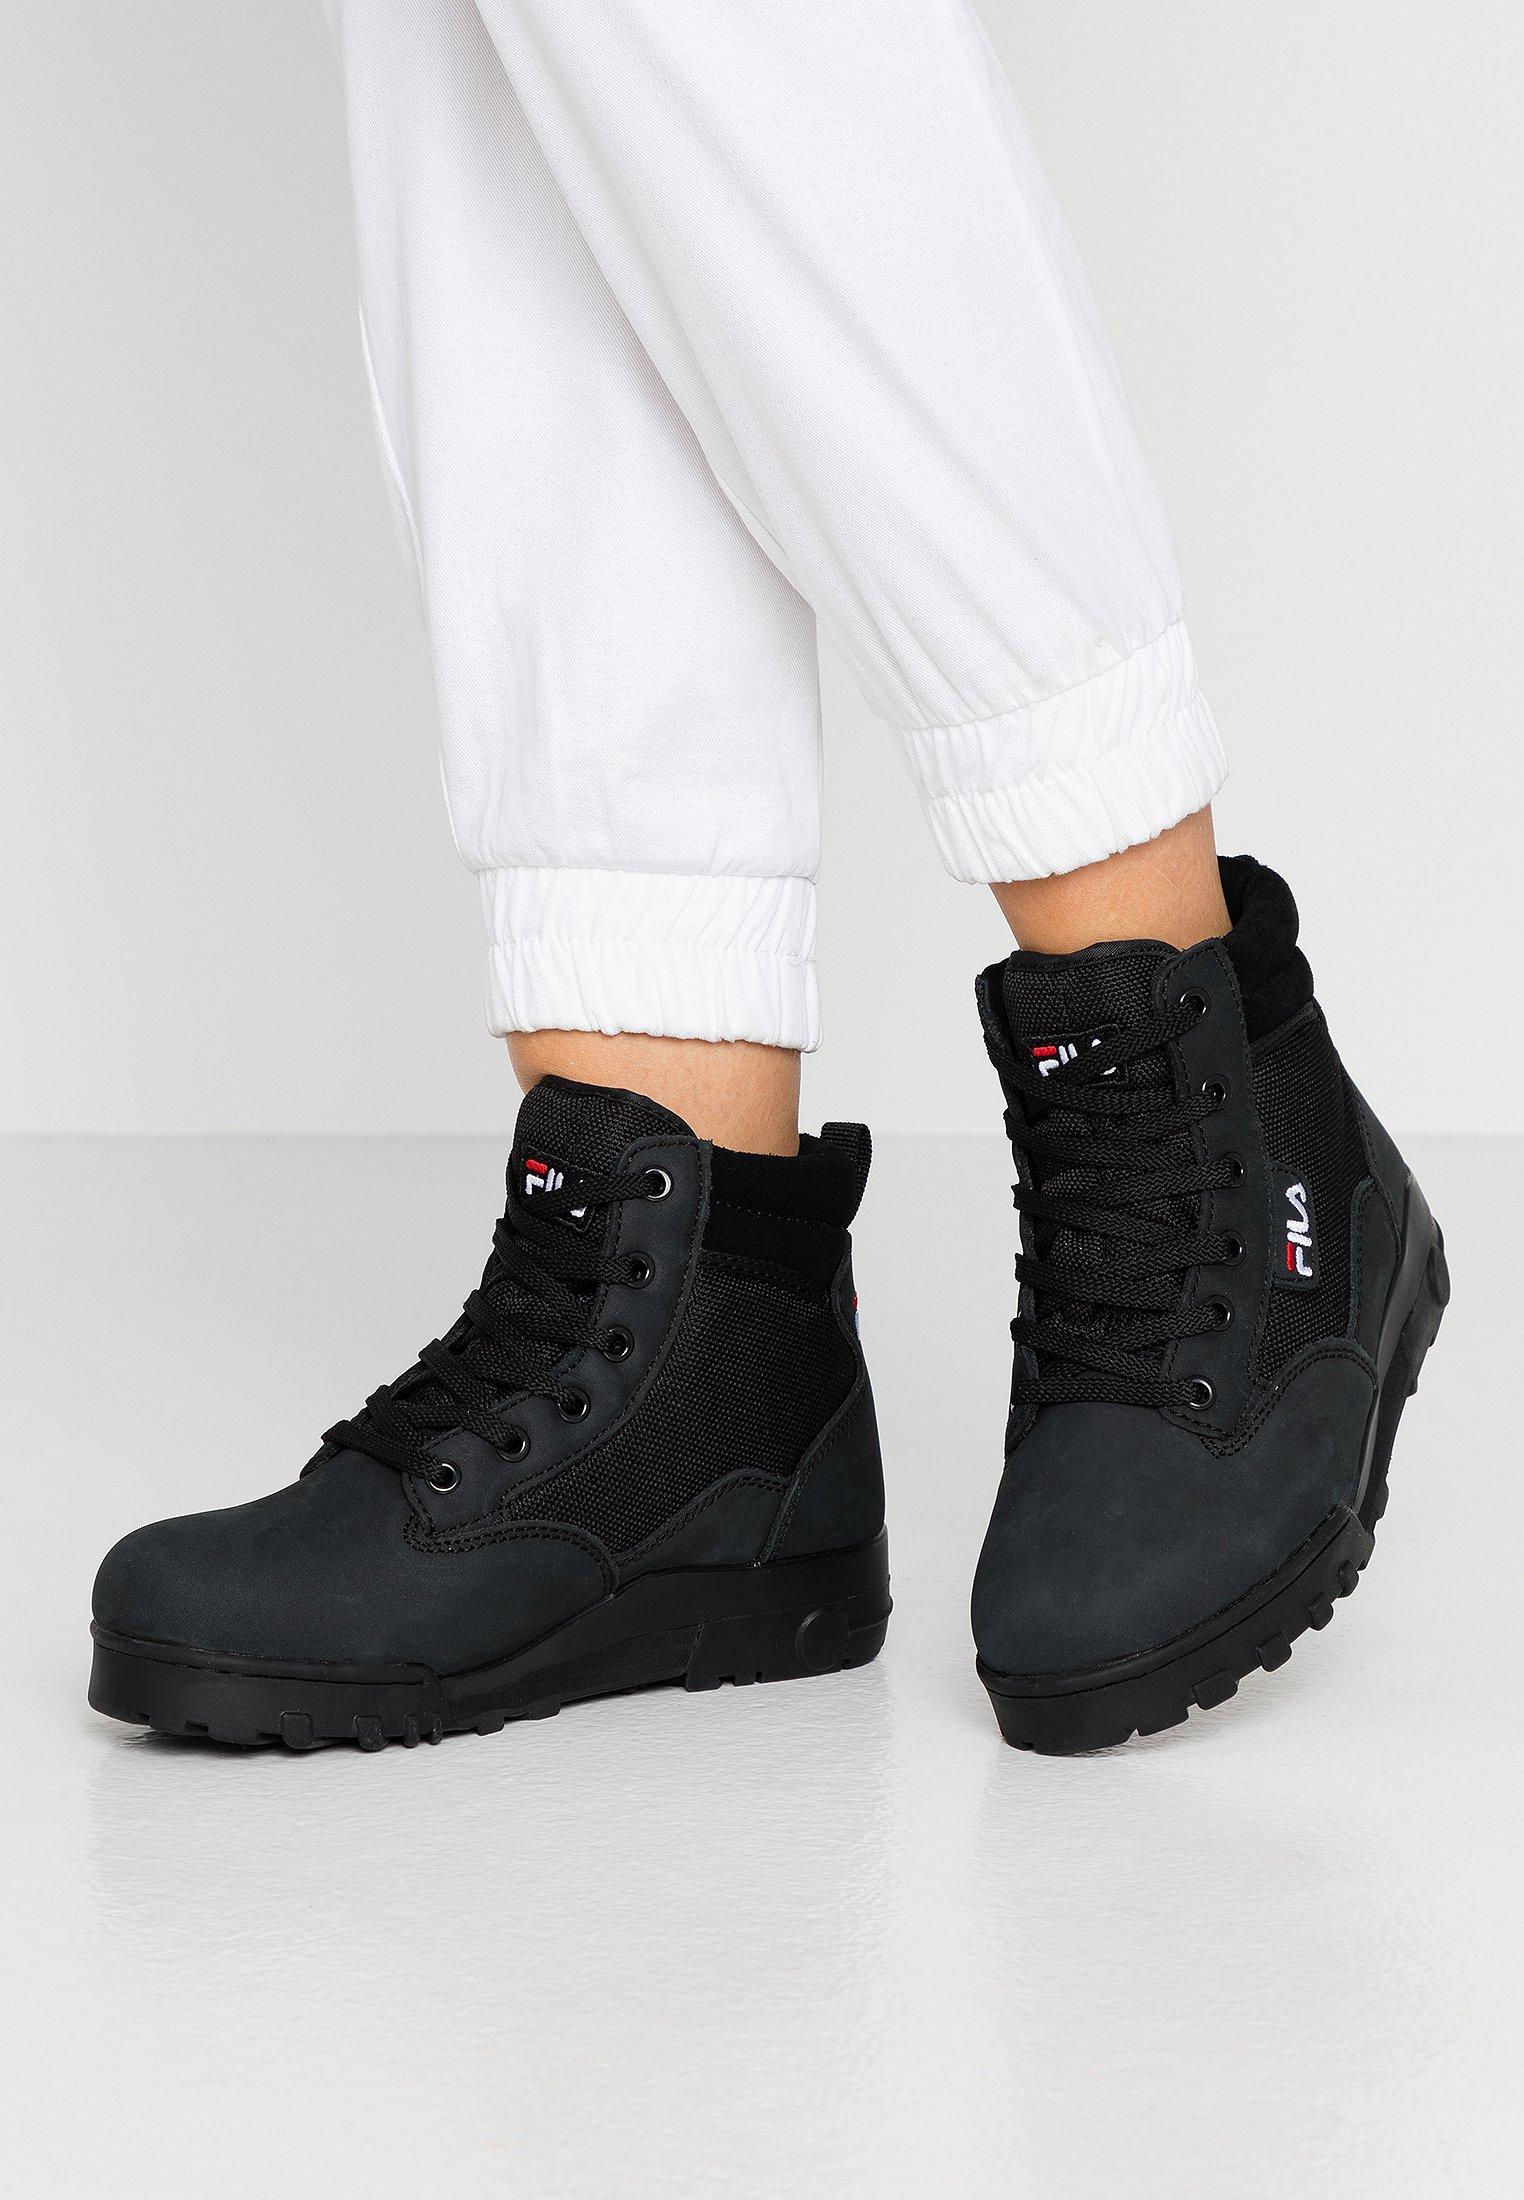 Fila GRUNGE II MID - Ankle Boot - black | Damen Schuhe 2020